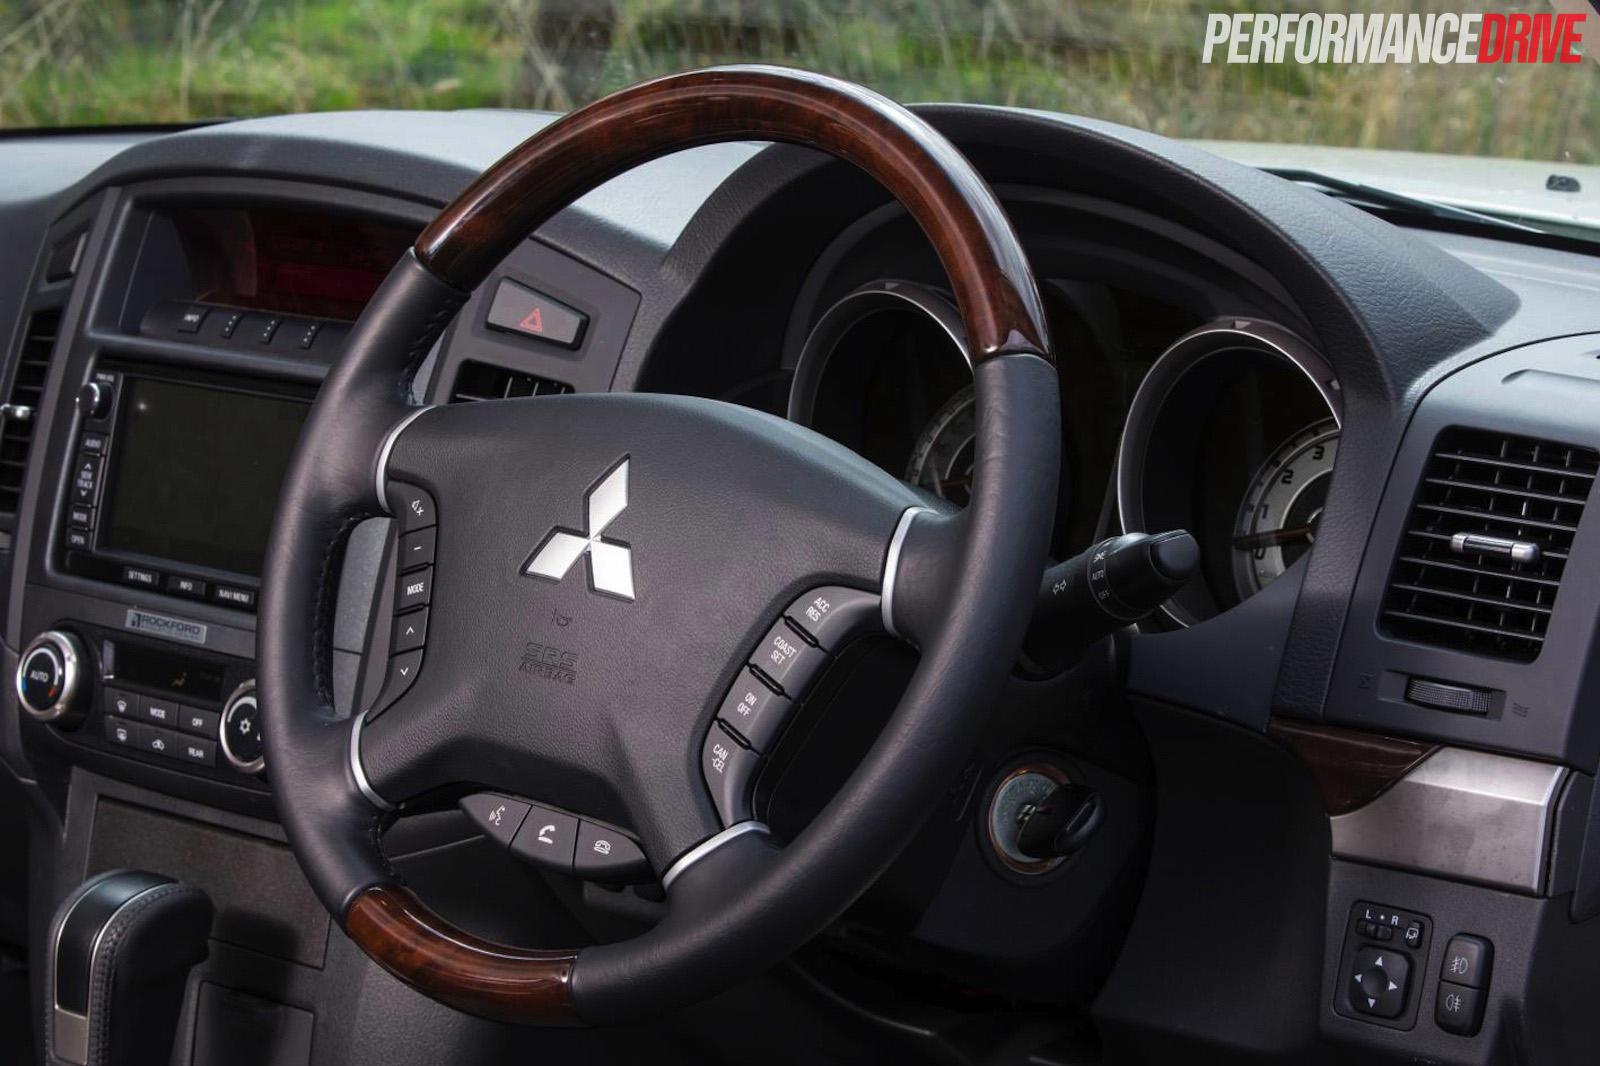 2015 Mitsubishi Pajero Exceed Review Video